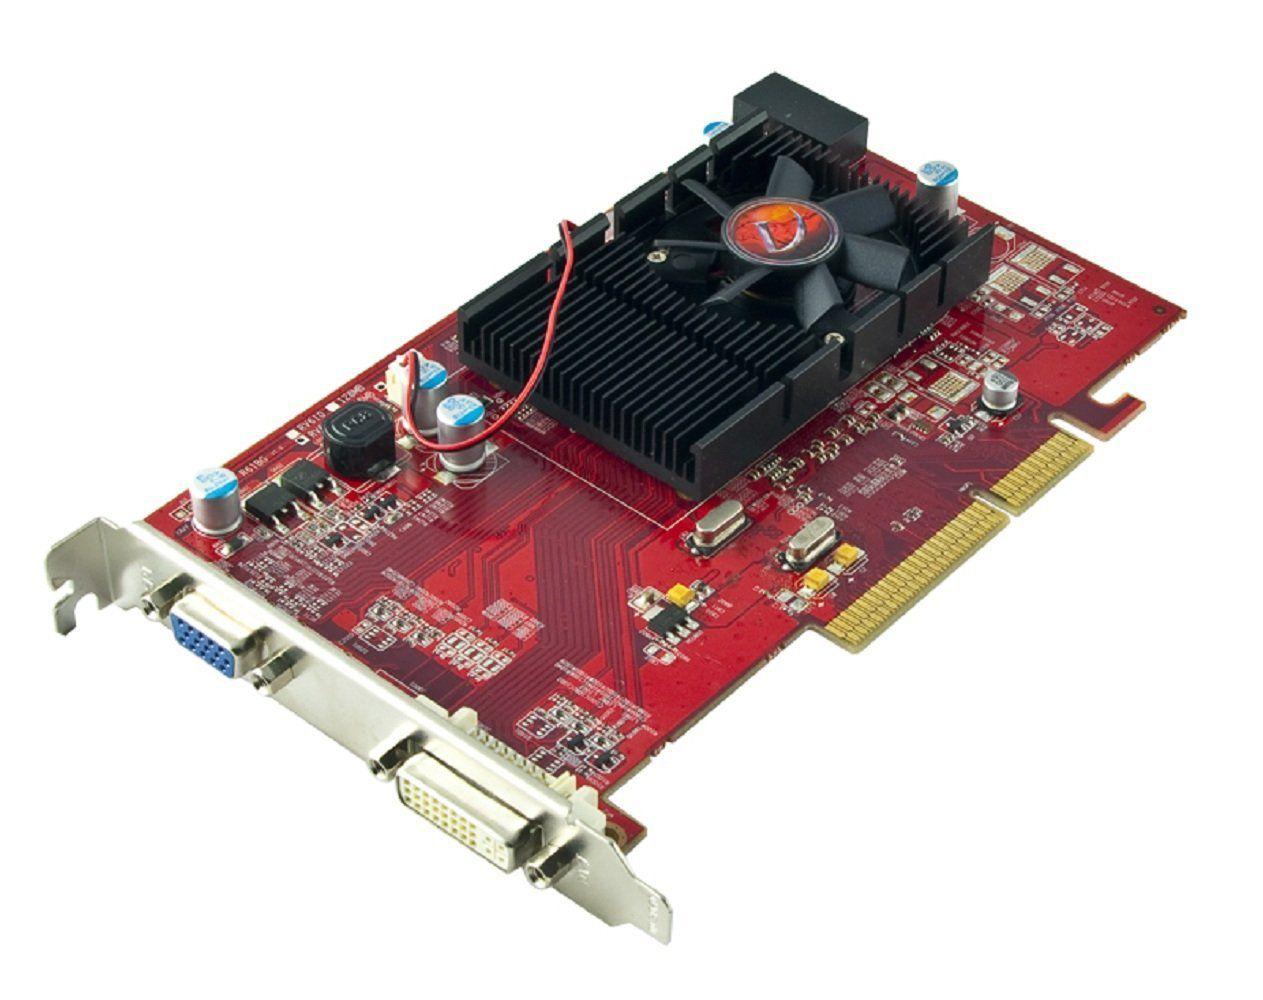 Best For DirectX 10 Support VisionTek Radeon 3450